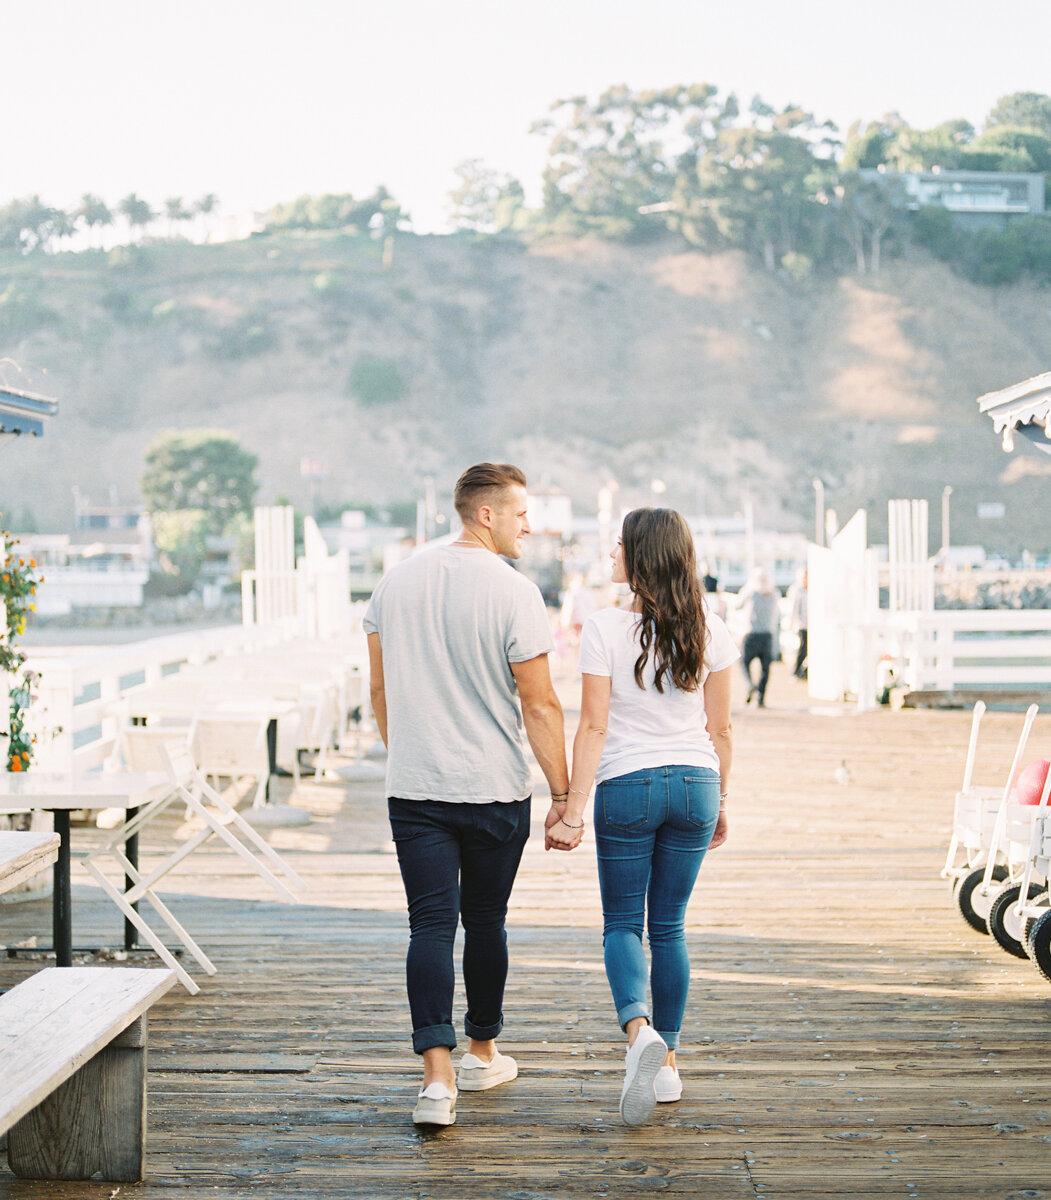 Malibu_Farm_Engagement_Photos_Anya_Kernes_Photography_A&B-6.jpg